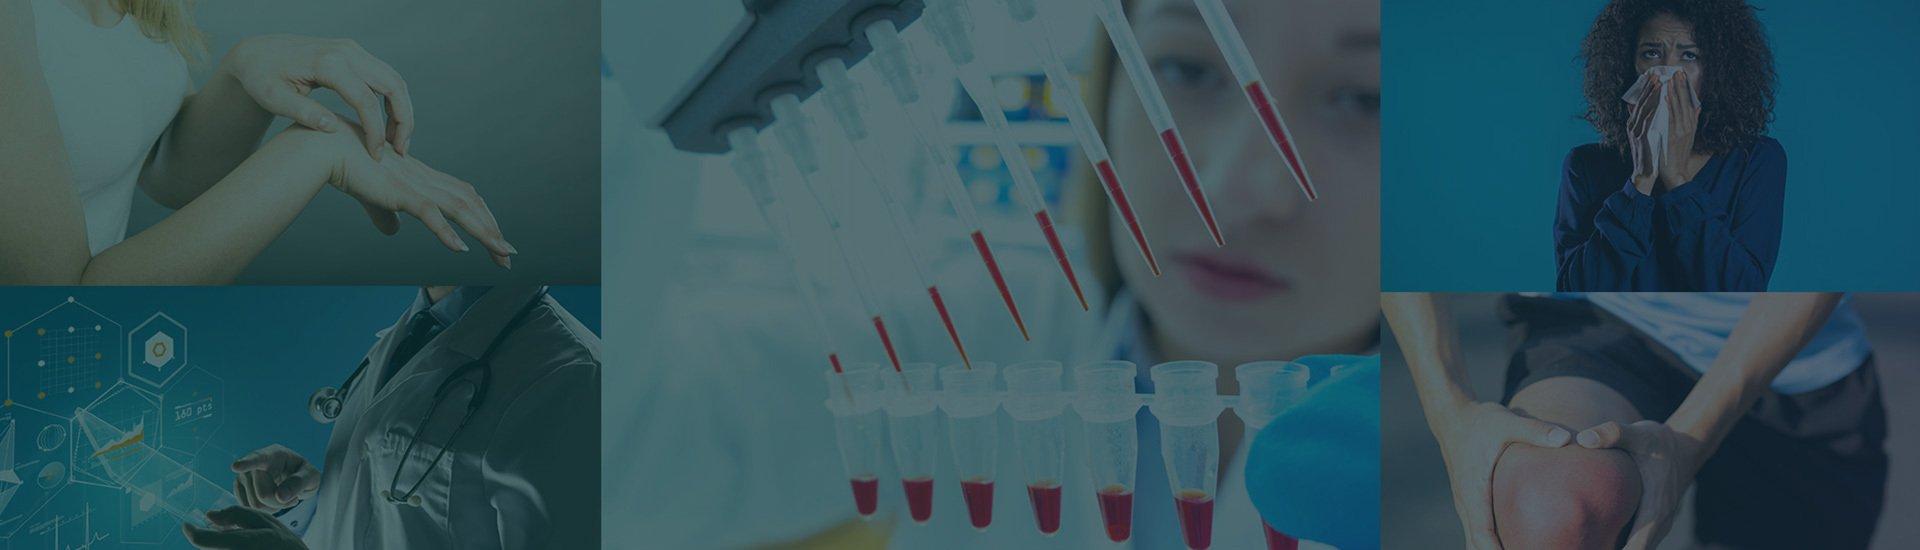 Therapeutic Areas - Clinical Trial CRO - Criterium